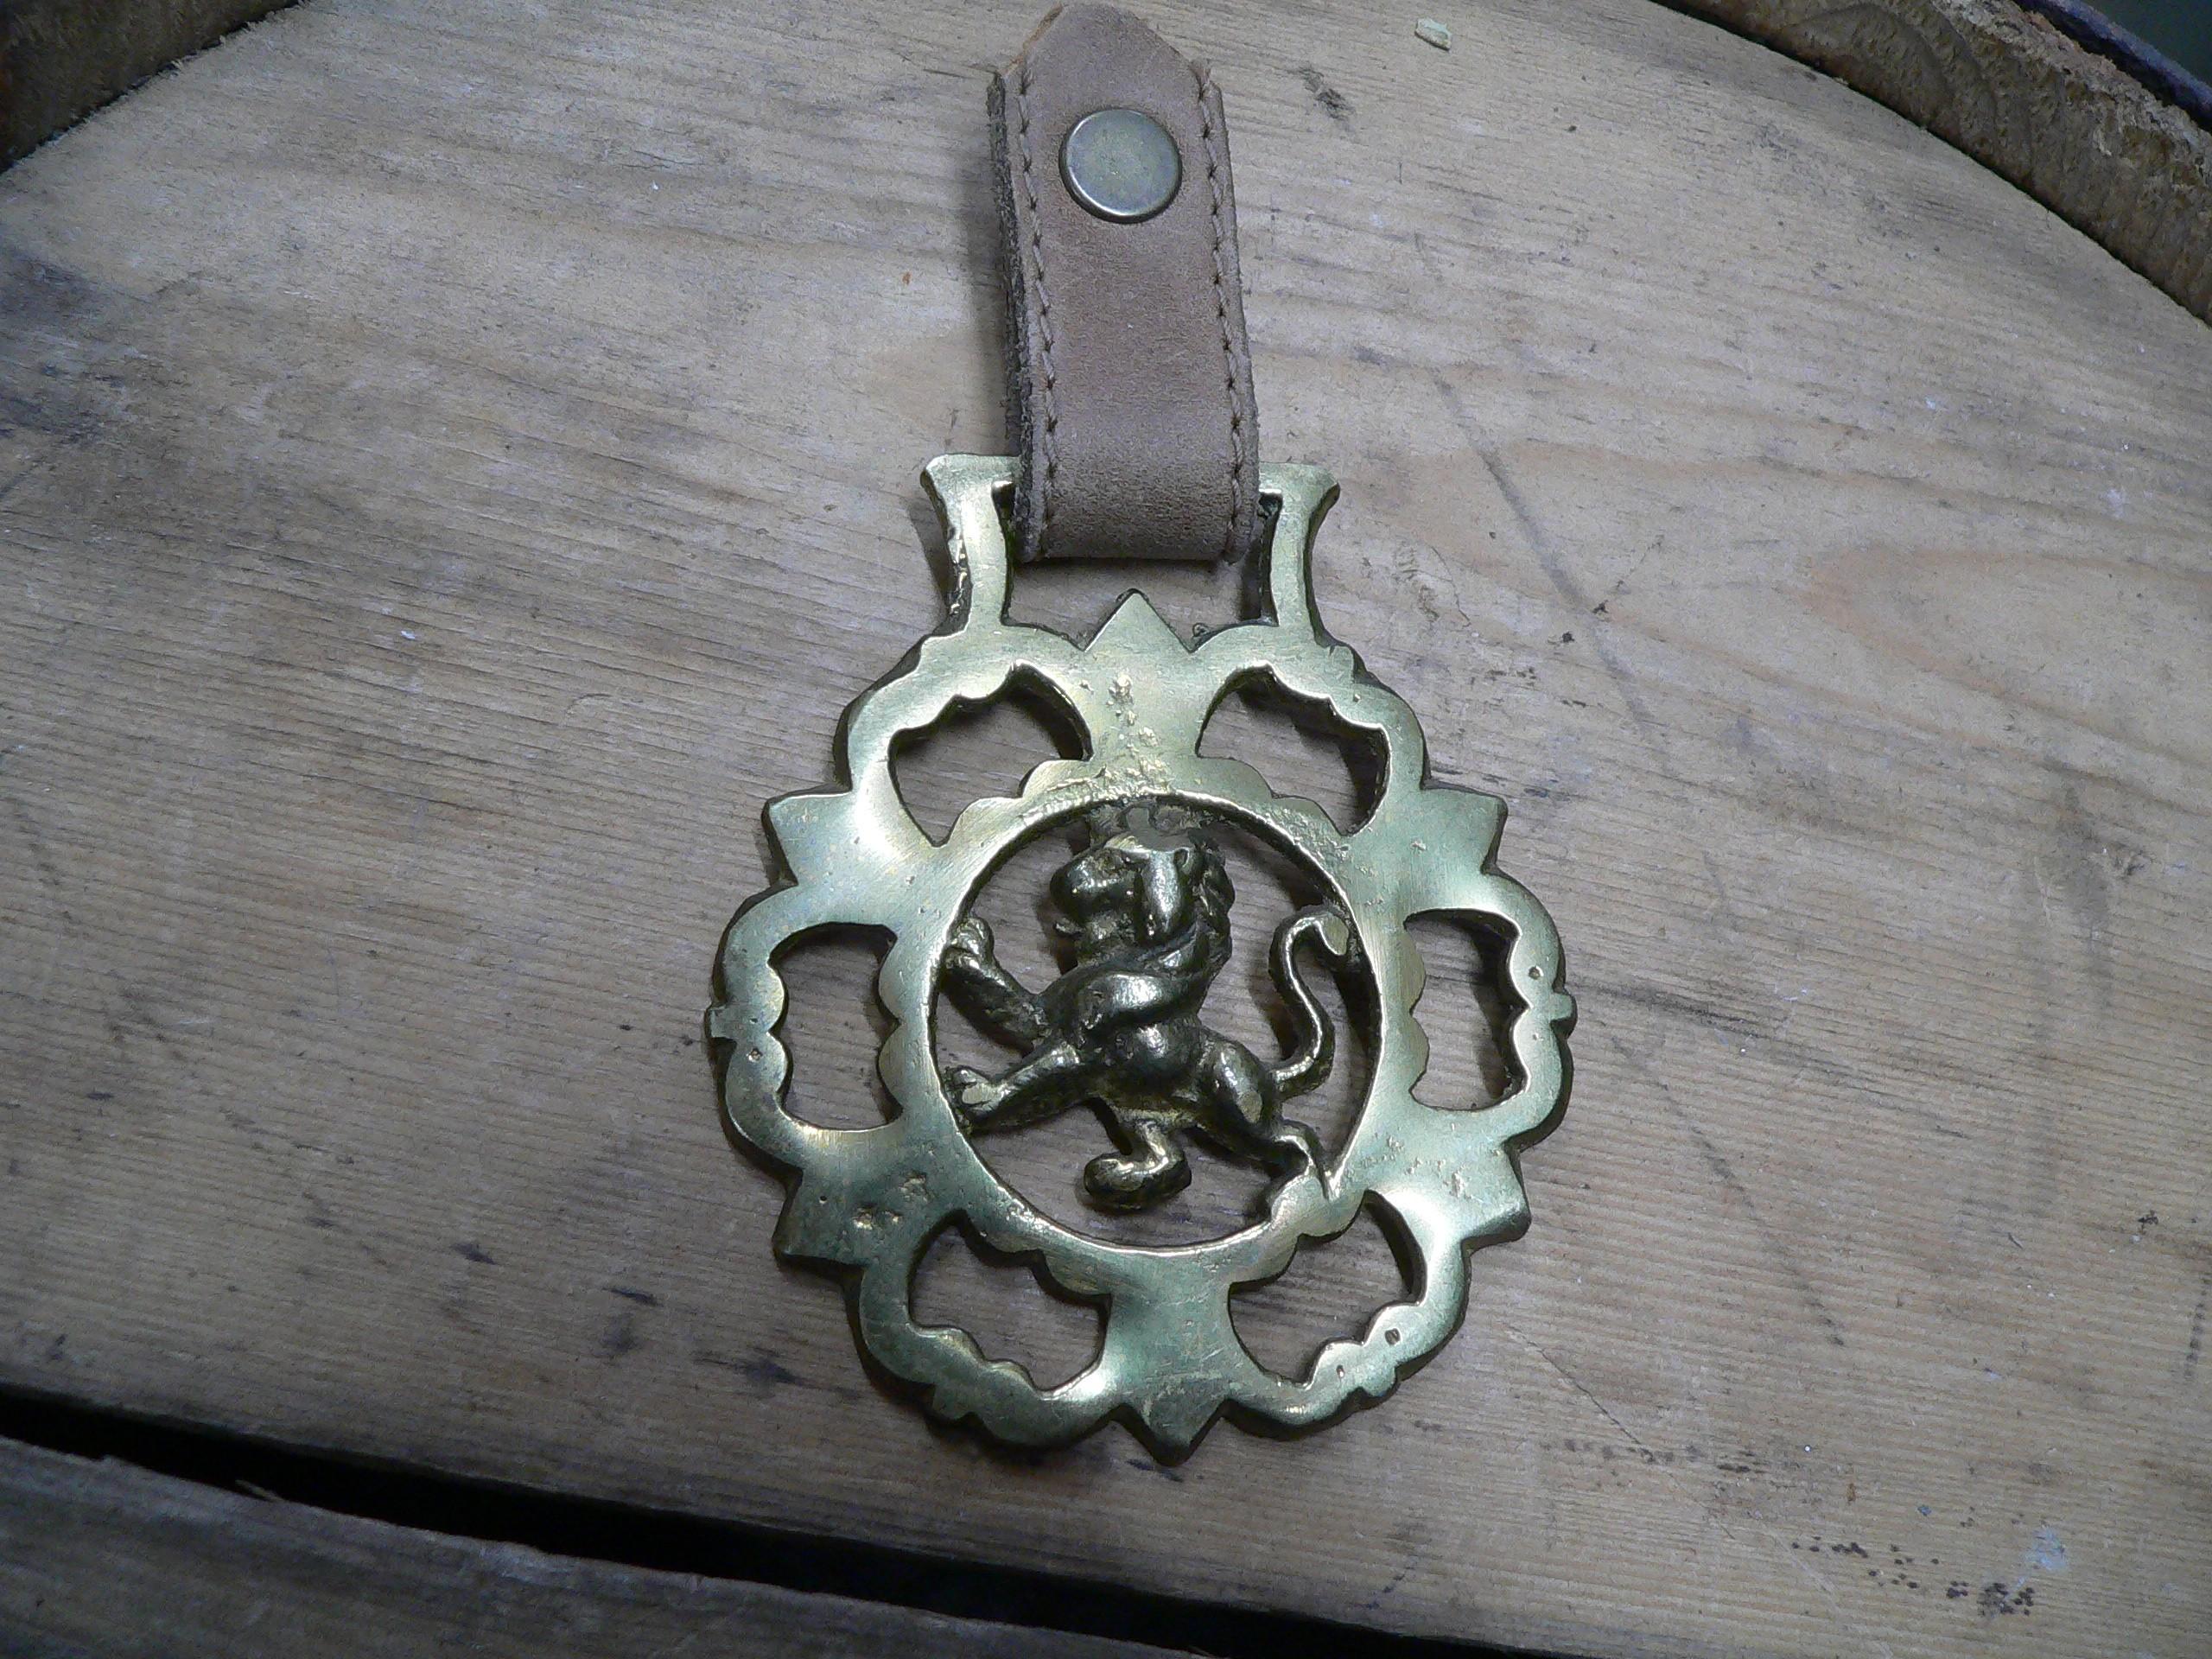 Médaille en brasse lion # 6915.4